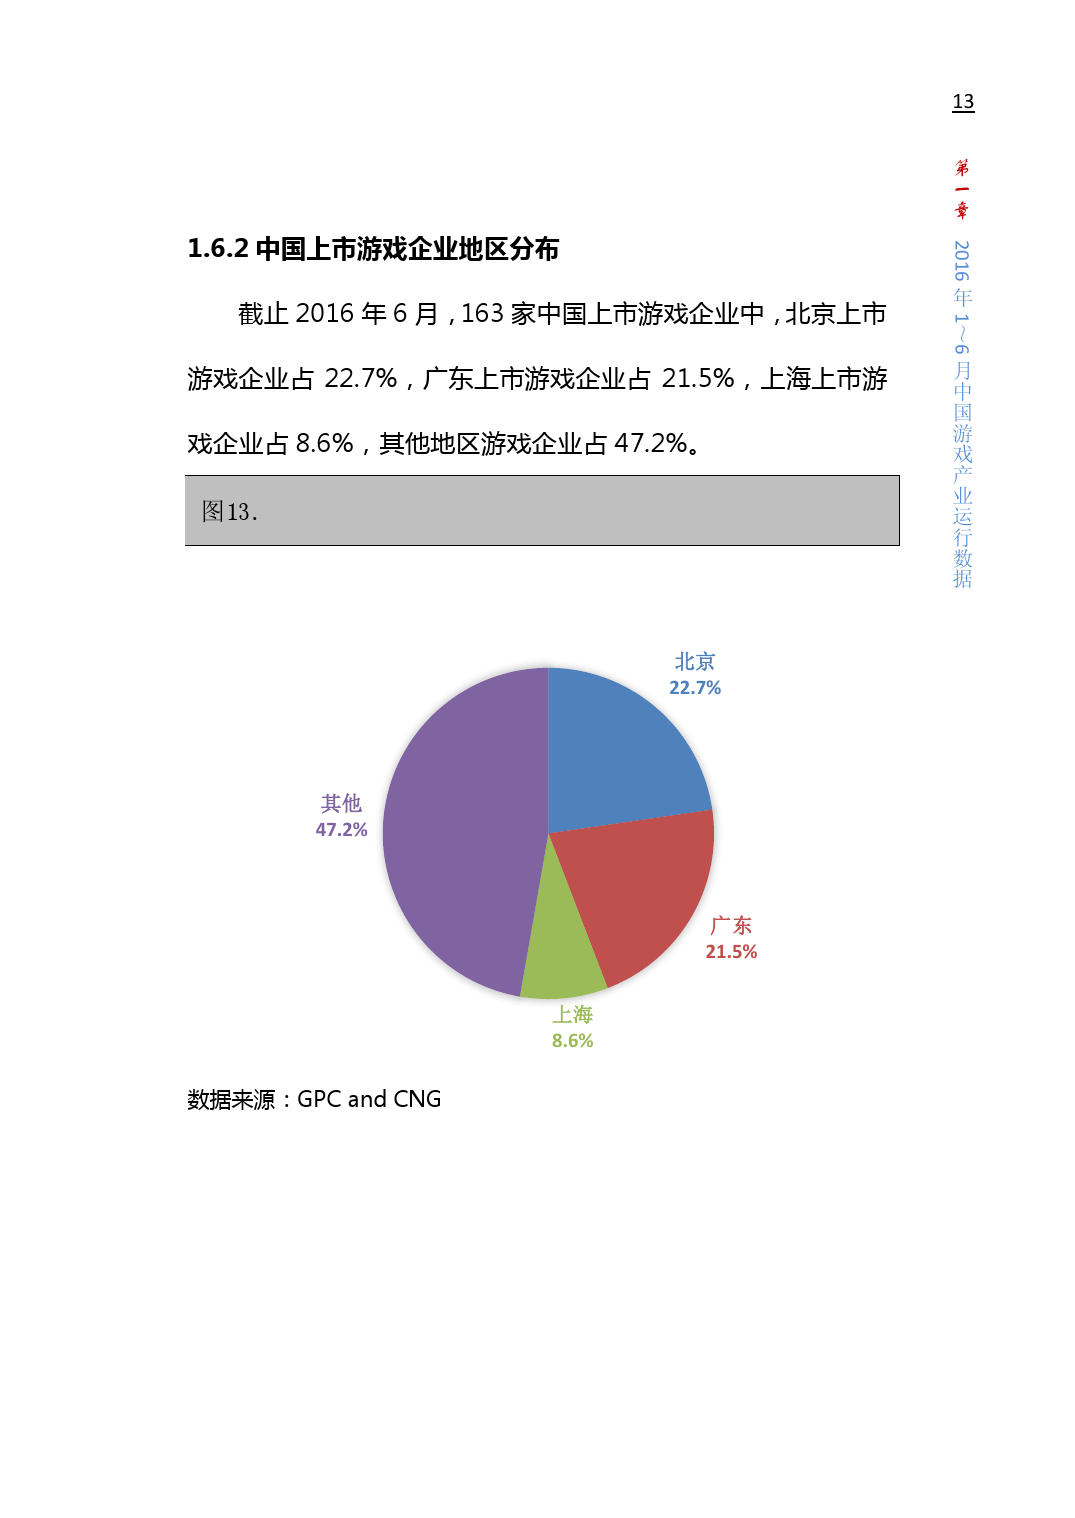 2016%e5%b9%b41-6%e6%9c%88%e4%b8%ad%e5%9b%bd%e4%ba%a7%e4%b8%9a%e6%b8%b8%e6%88%8f%e6%8a%a5%e5%91%8a_000027